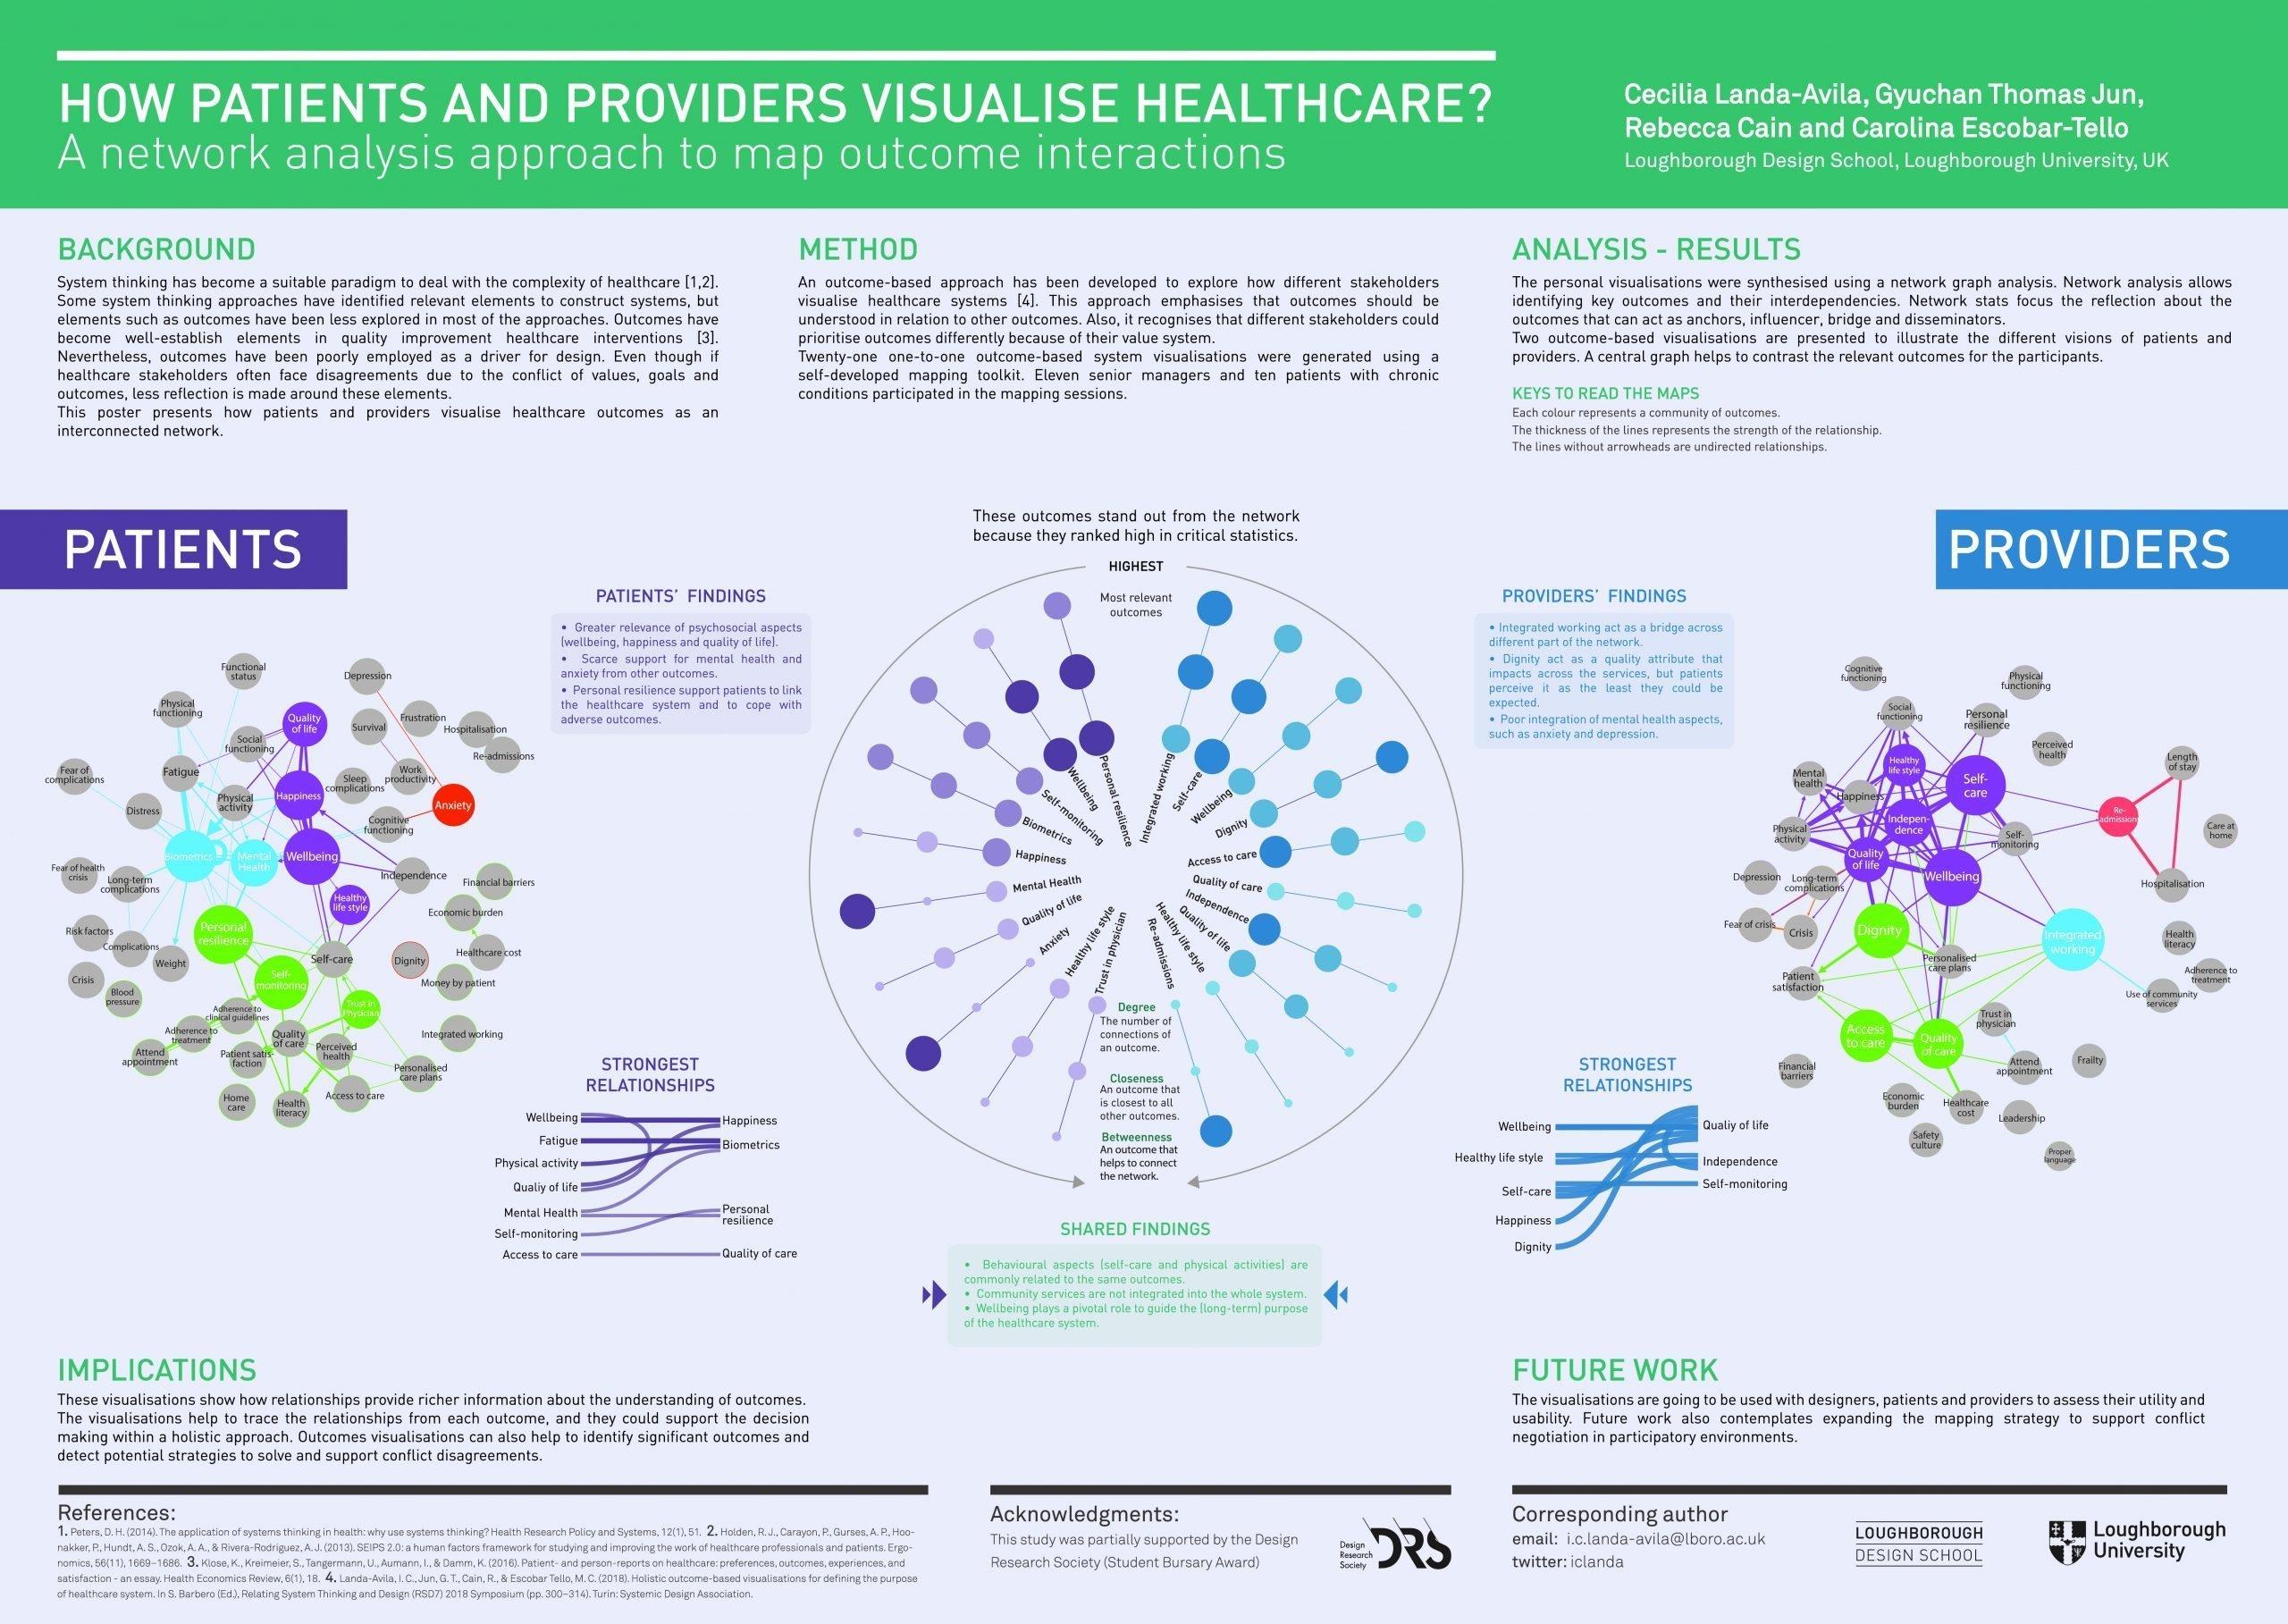 Healthcare visualisation